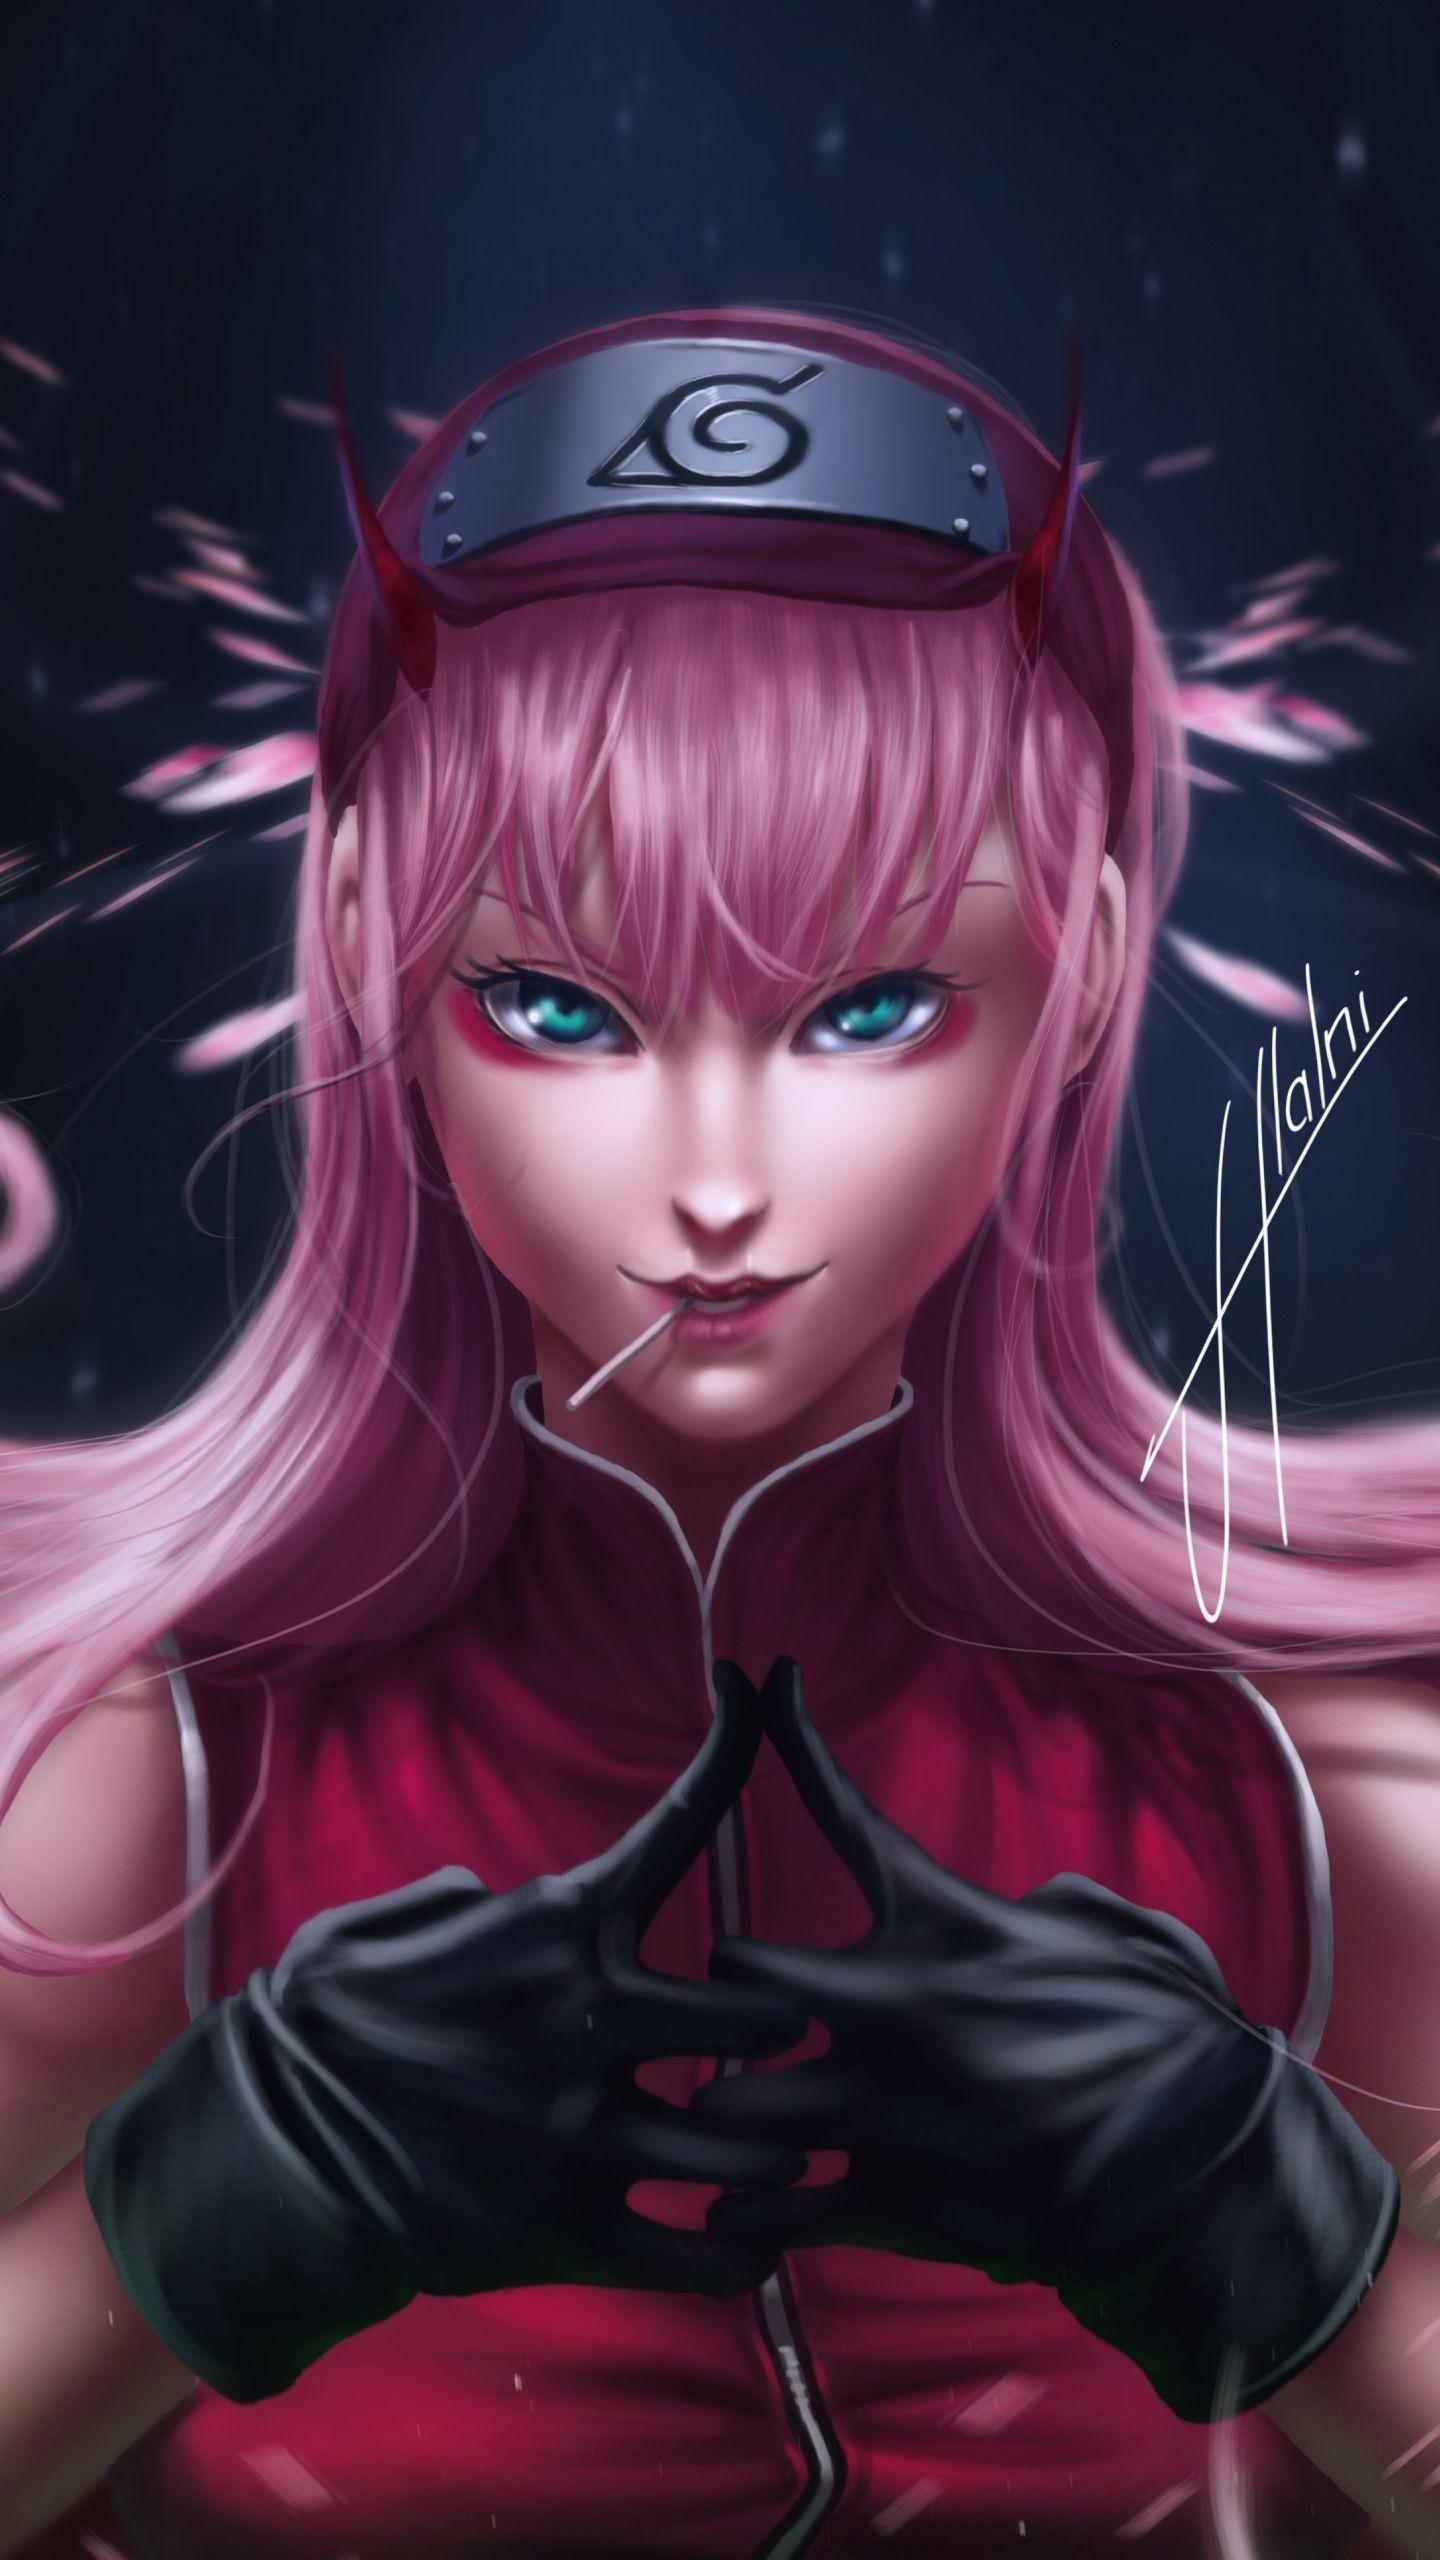 1440x2560 Anime Original Pink Hair Art Wallpaper Anime Warrior Girl Anime Wallpaper Download Anime